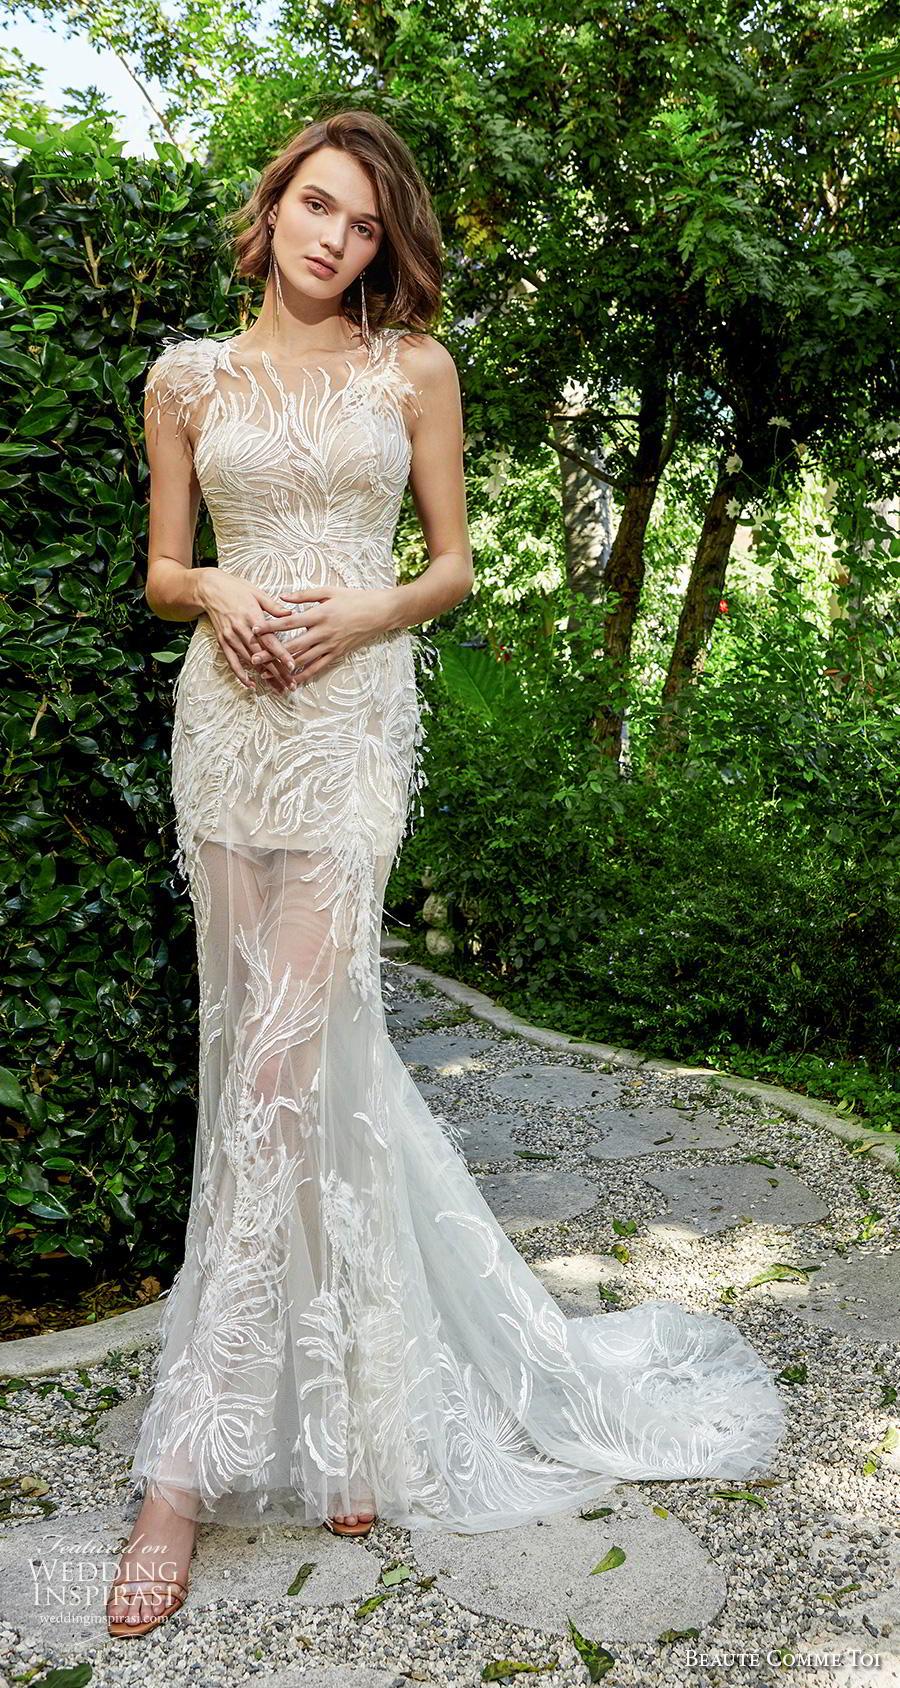 beaute comme toi f2020 bridal feather one shoulder sleeves illusion neckline full embellishment elegant glamorous fit and flare sheath wedding dress lace button back medium train (miya) mv